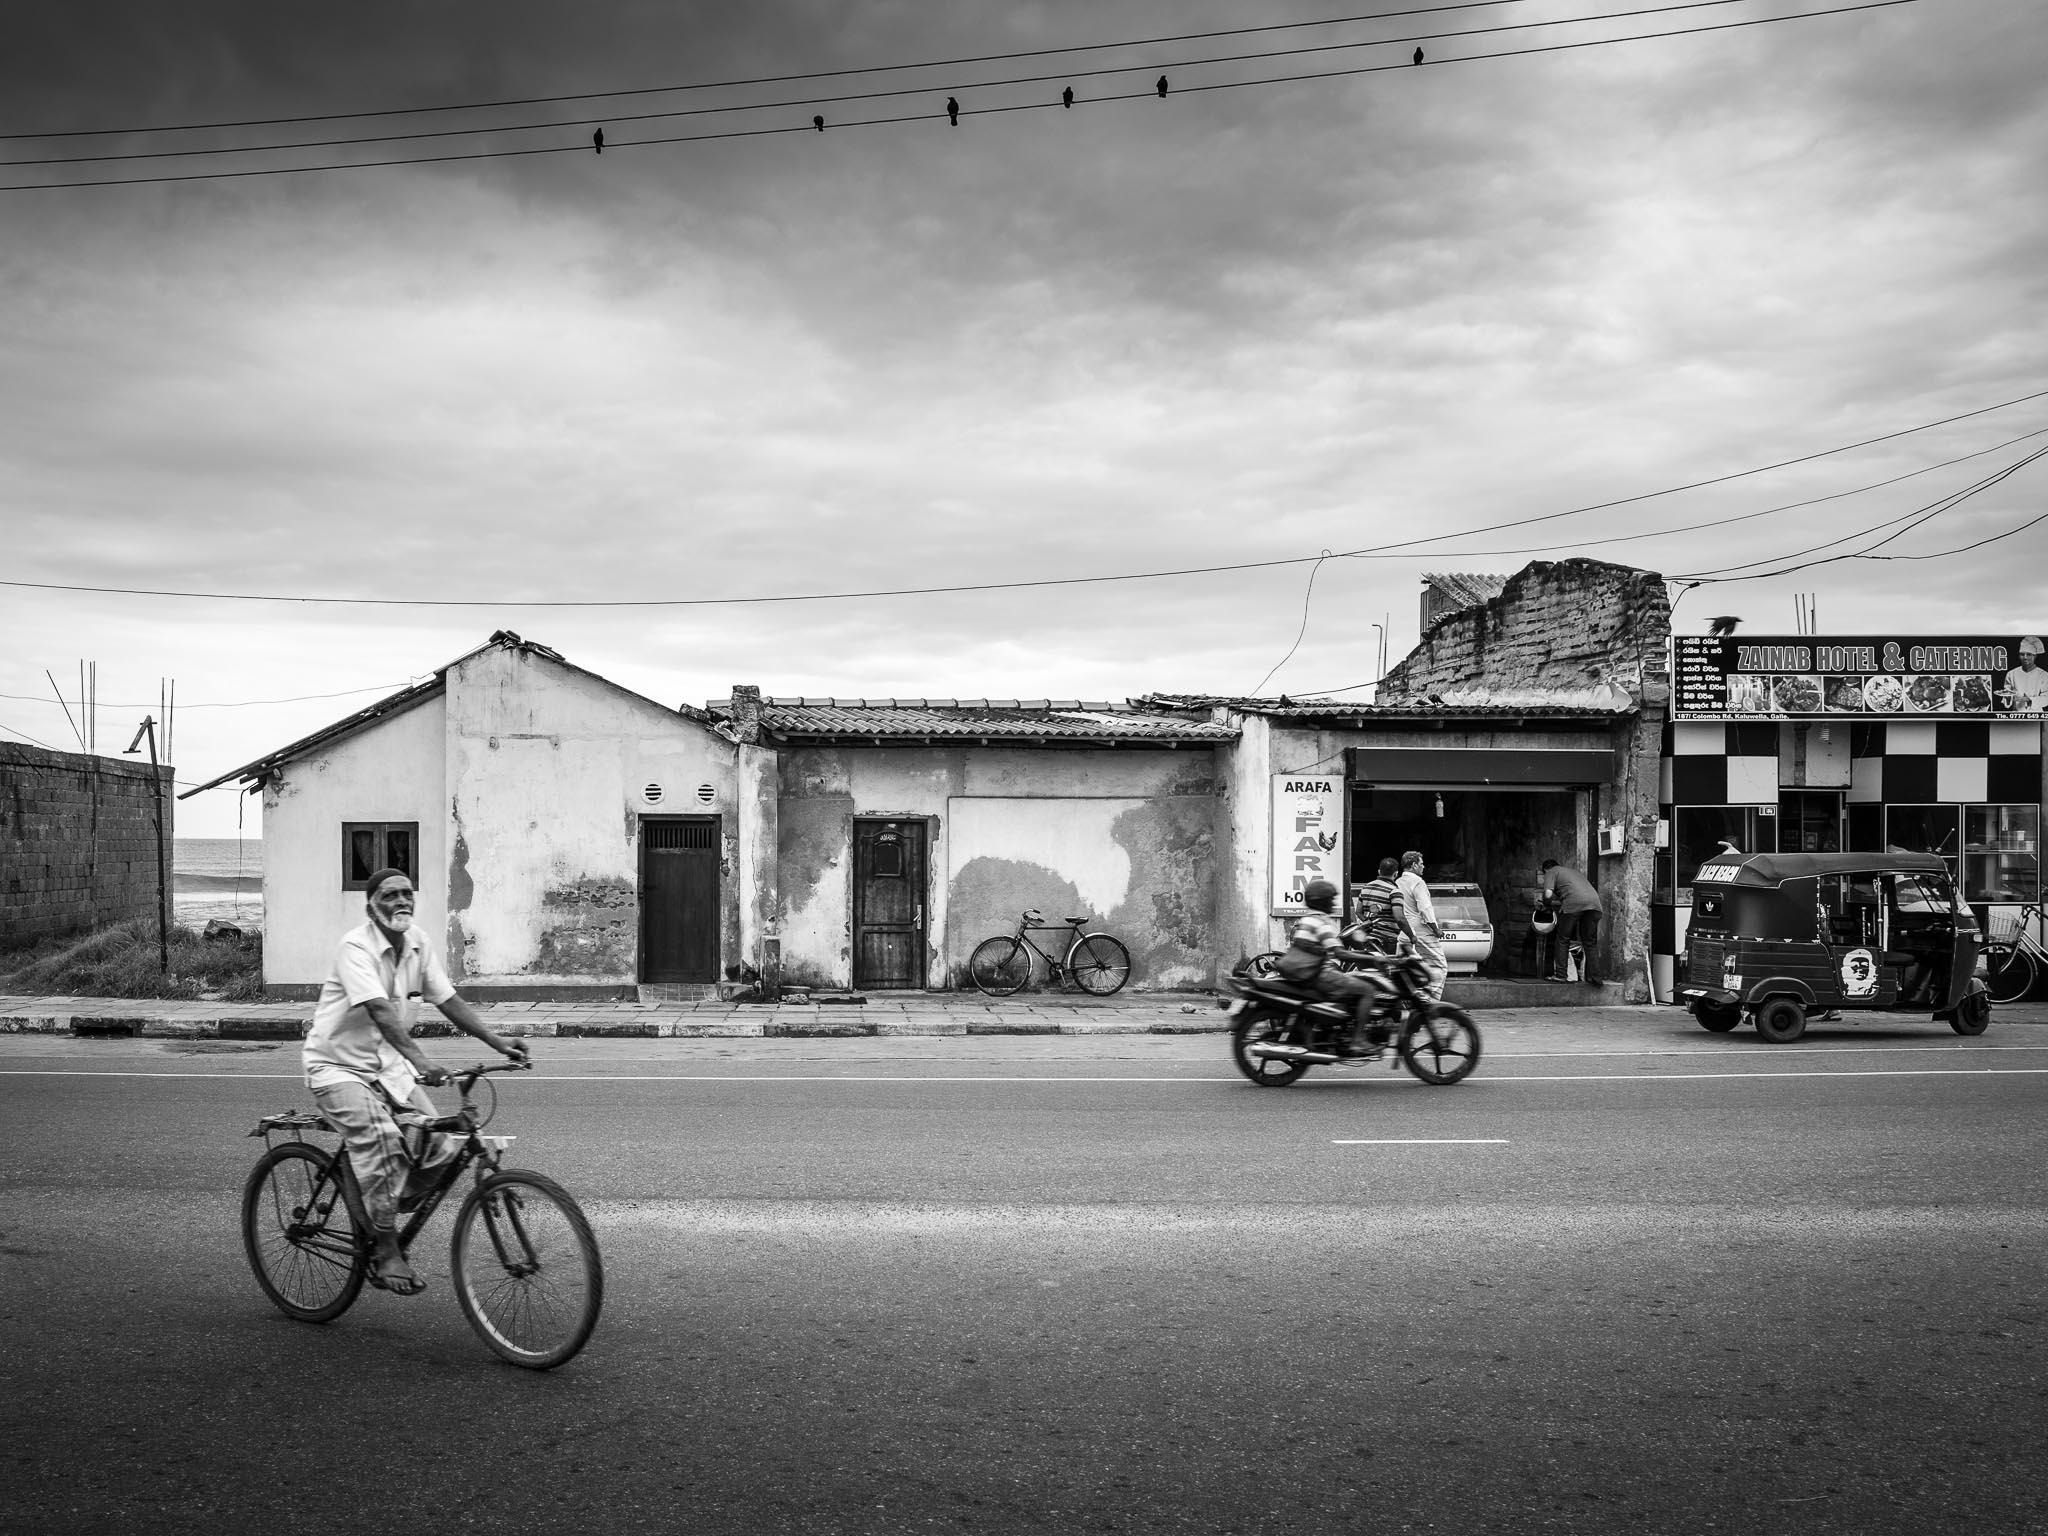 Untitled (Leica Q)